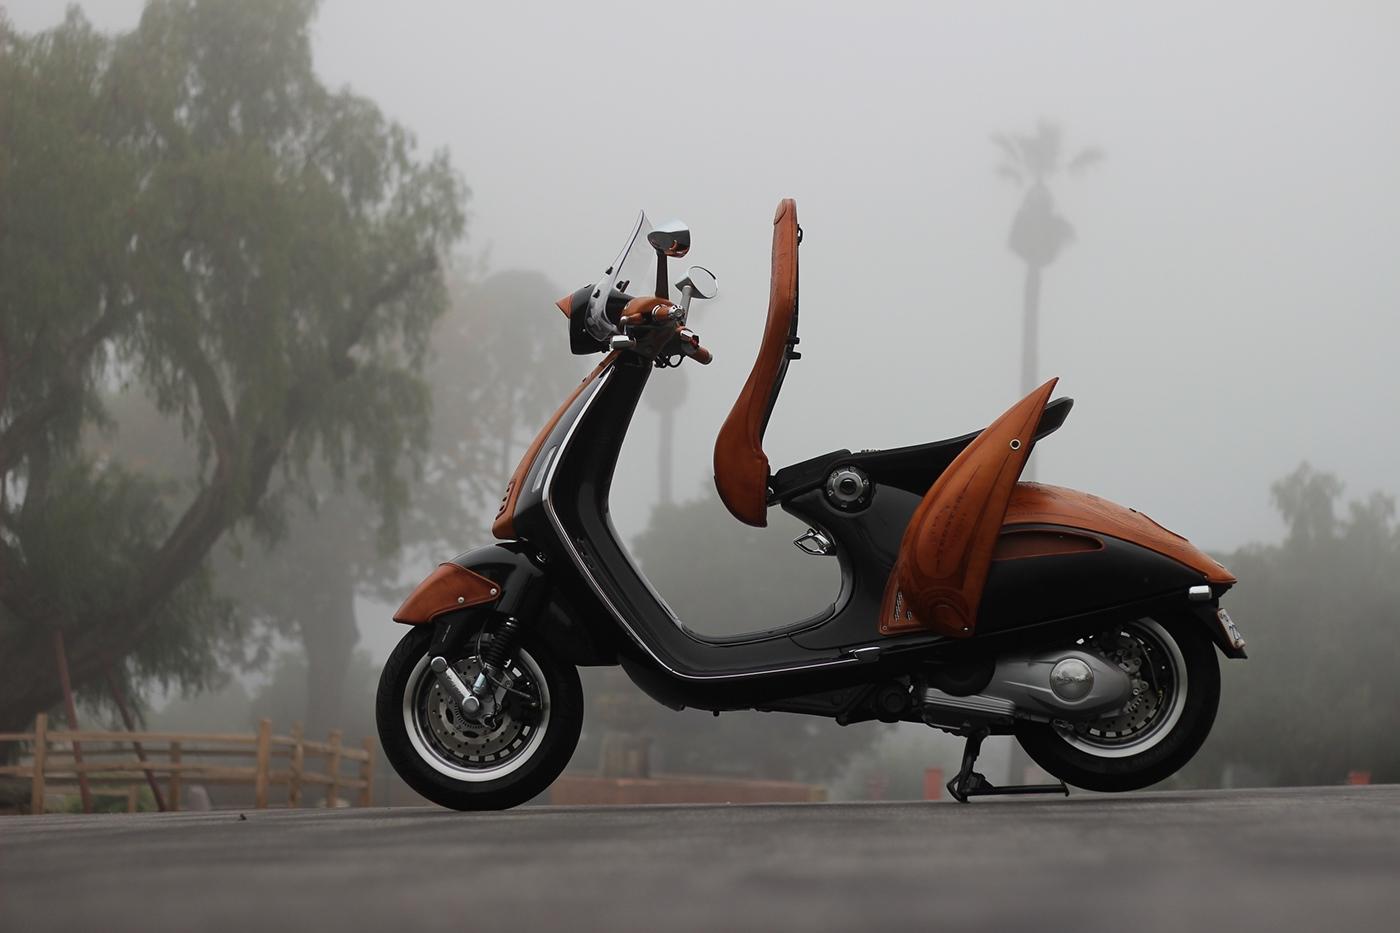 Project - Vespa 946 Bellissima / TEDST*R custom rides